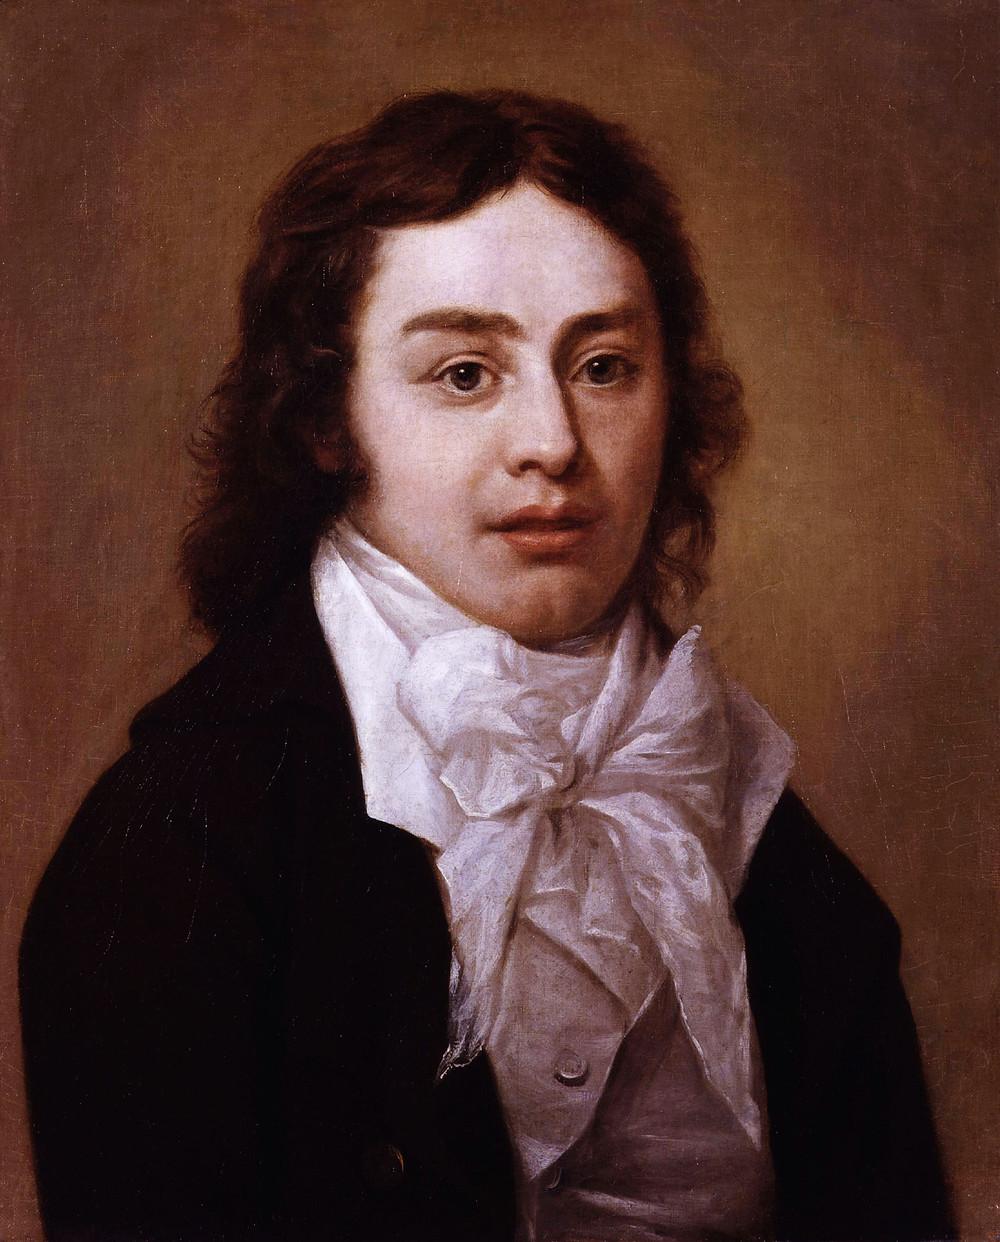 Samuel Taylor Coleridge, Scalesceugh Hall & Villas, retire to Cumbria